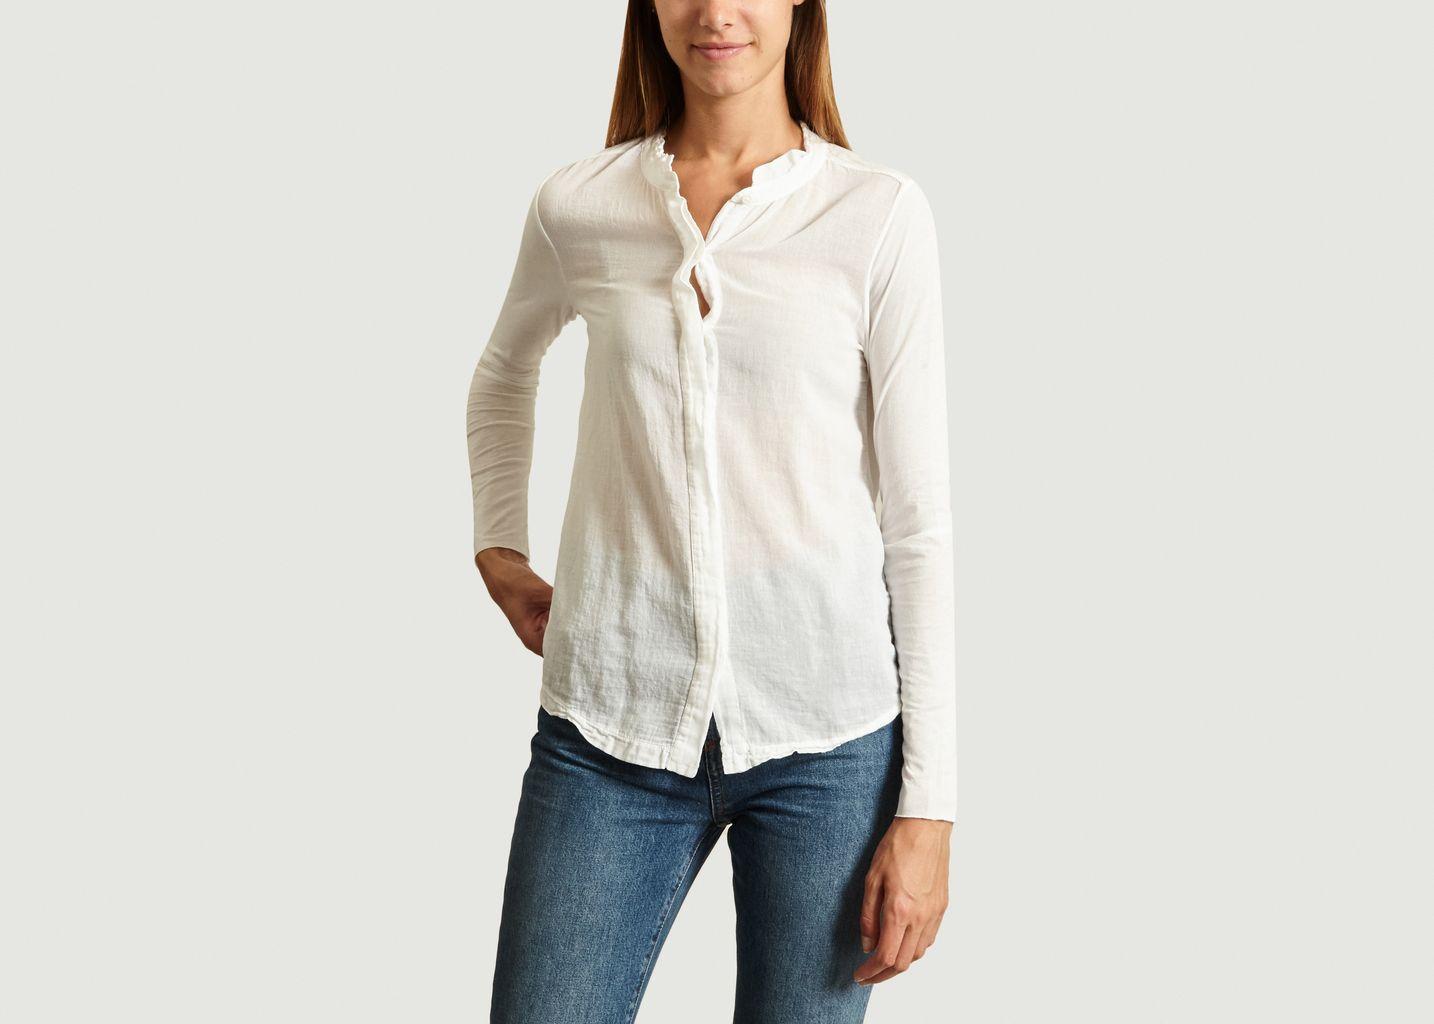 T-shirt Tiercol - Hartford